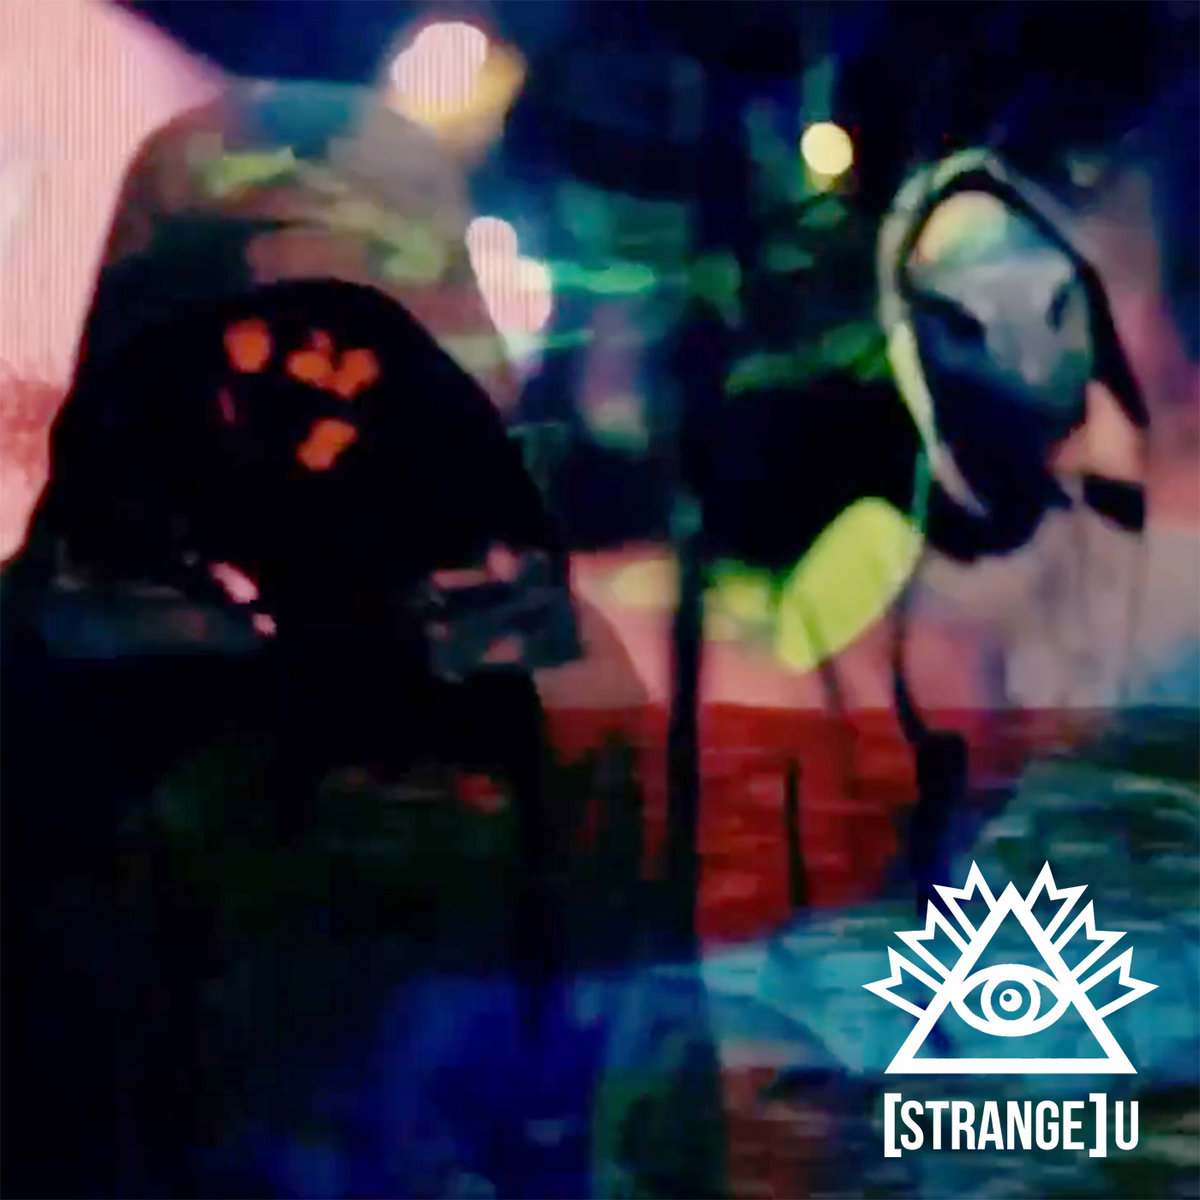 http://www.radiochantier.com/strange-u-ep-2040